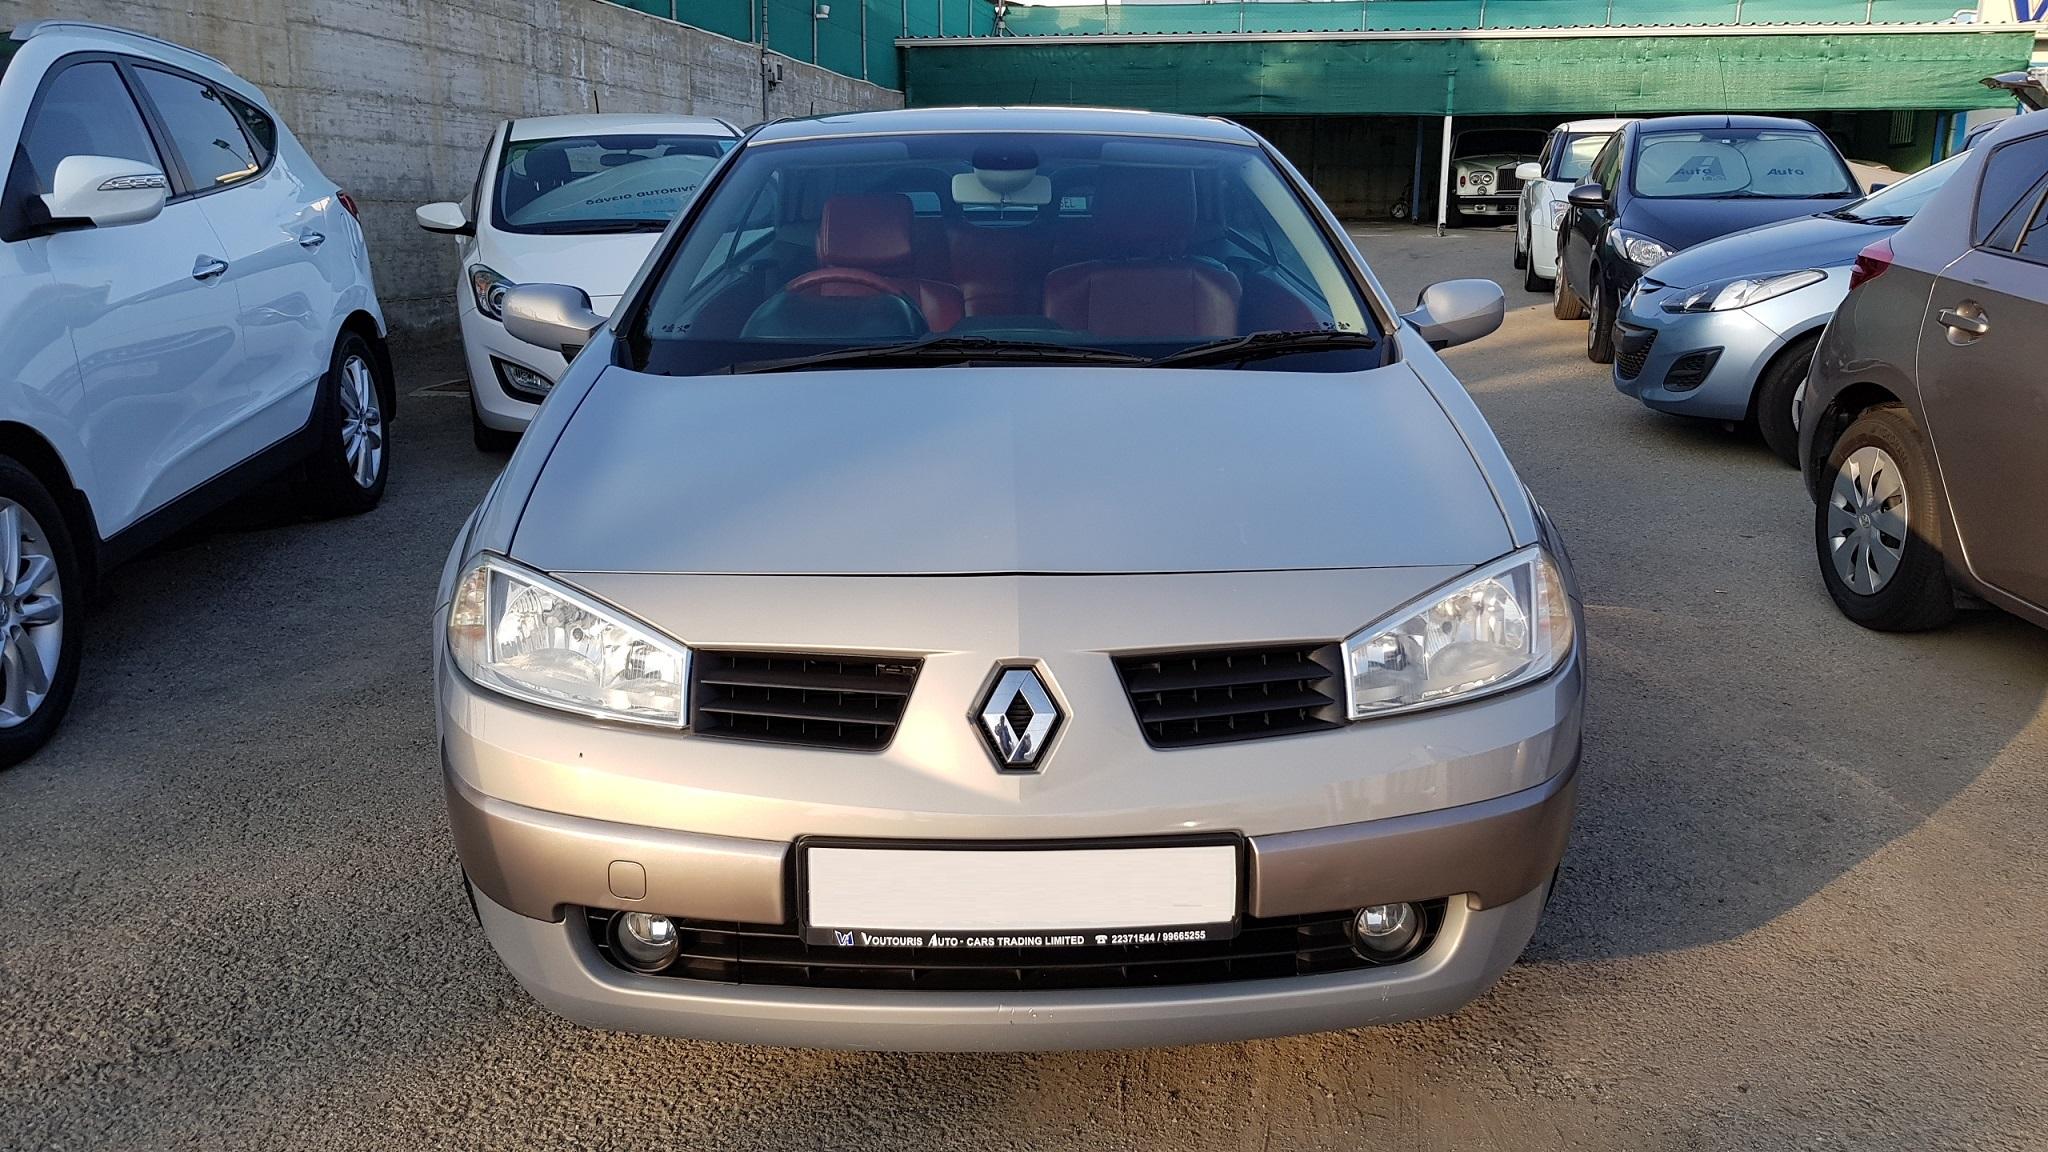 Renault Megane Convertible 03